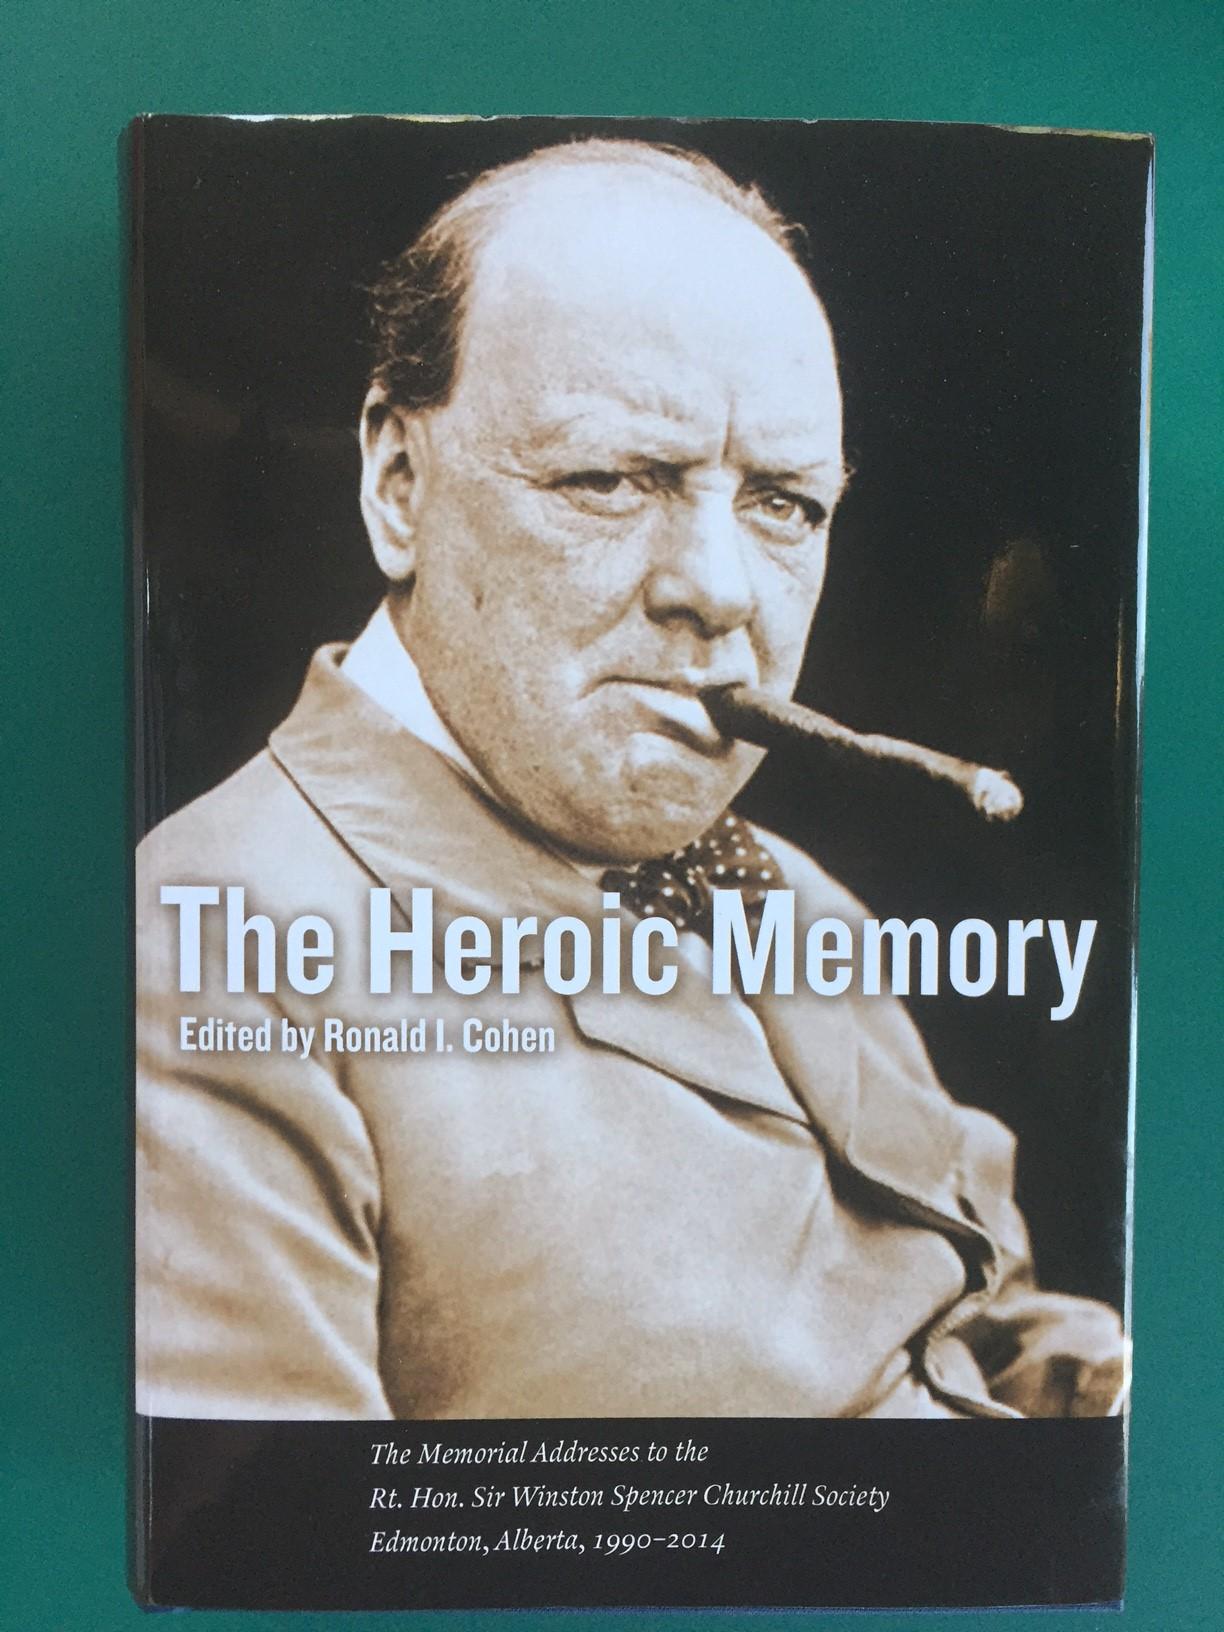 The Heroic Memory, VOL. II (2016)